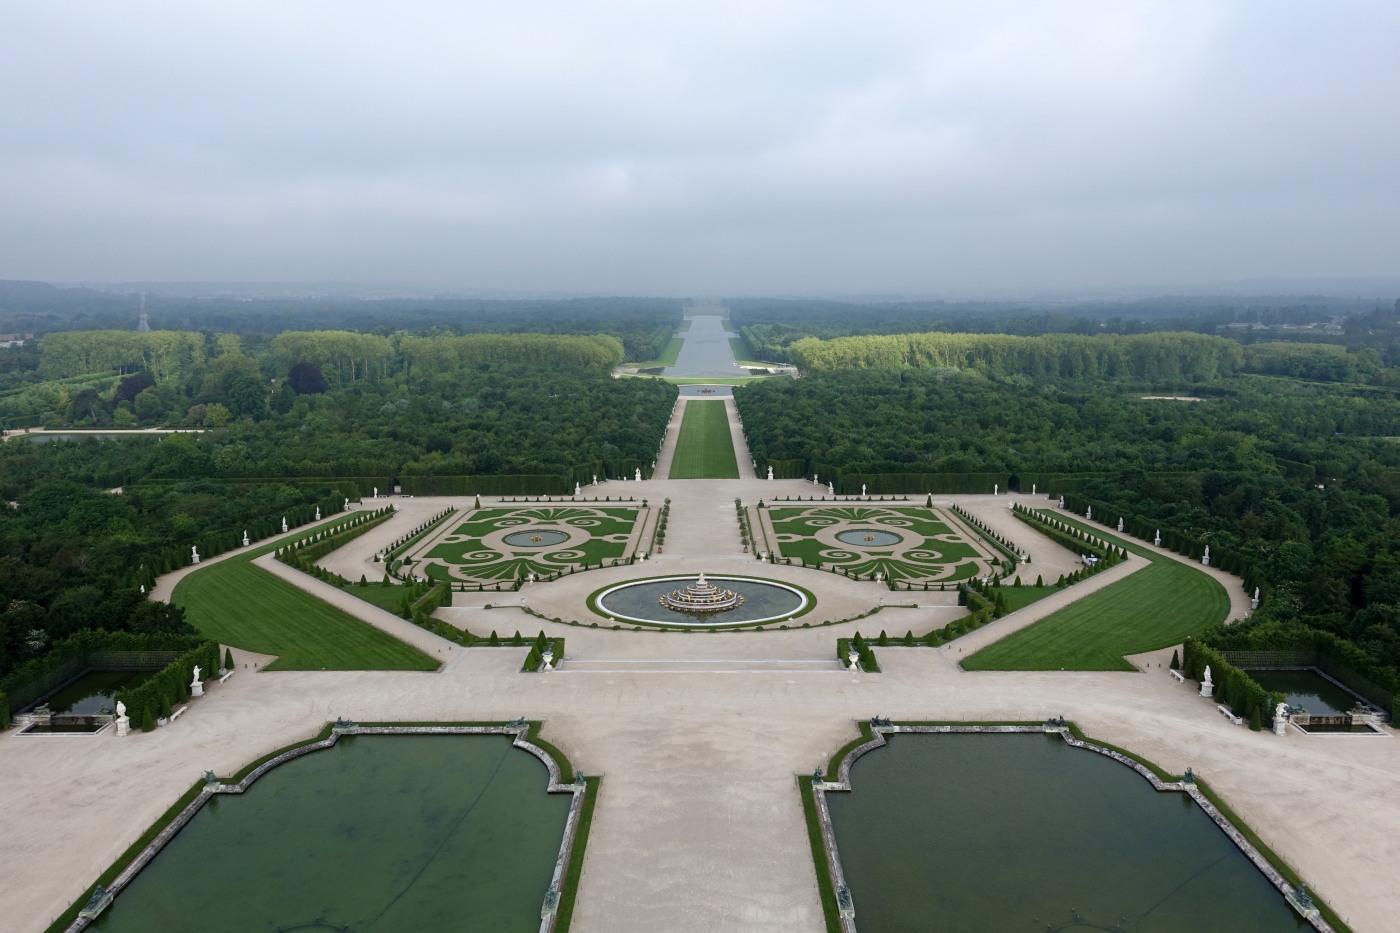 Giardini Moderni E Contemporanei : Partnership tra versailles e il palais de tokyo artribune